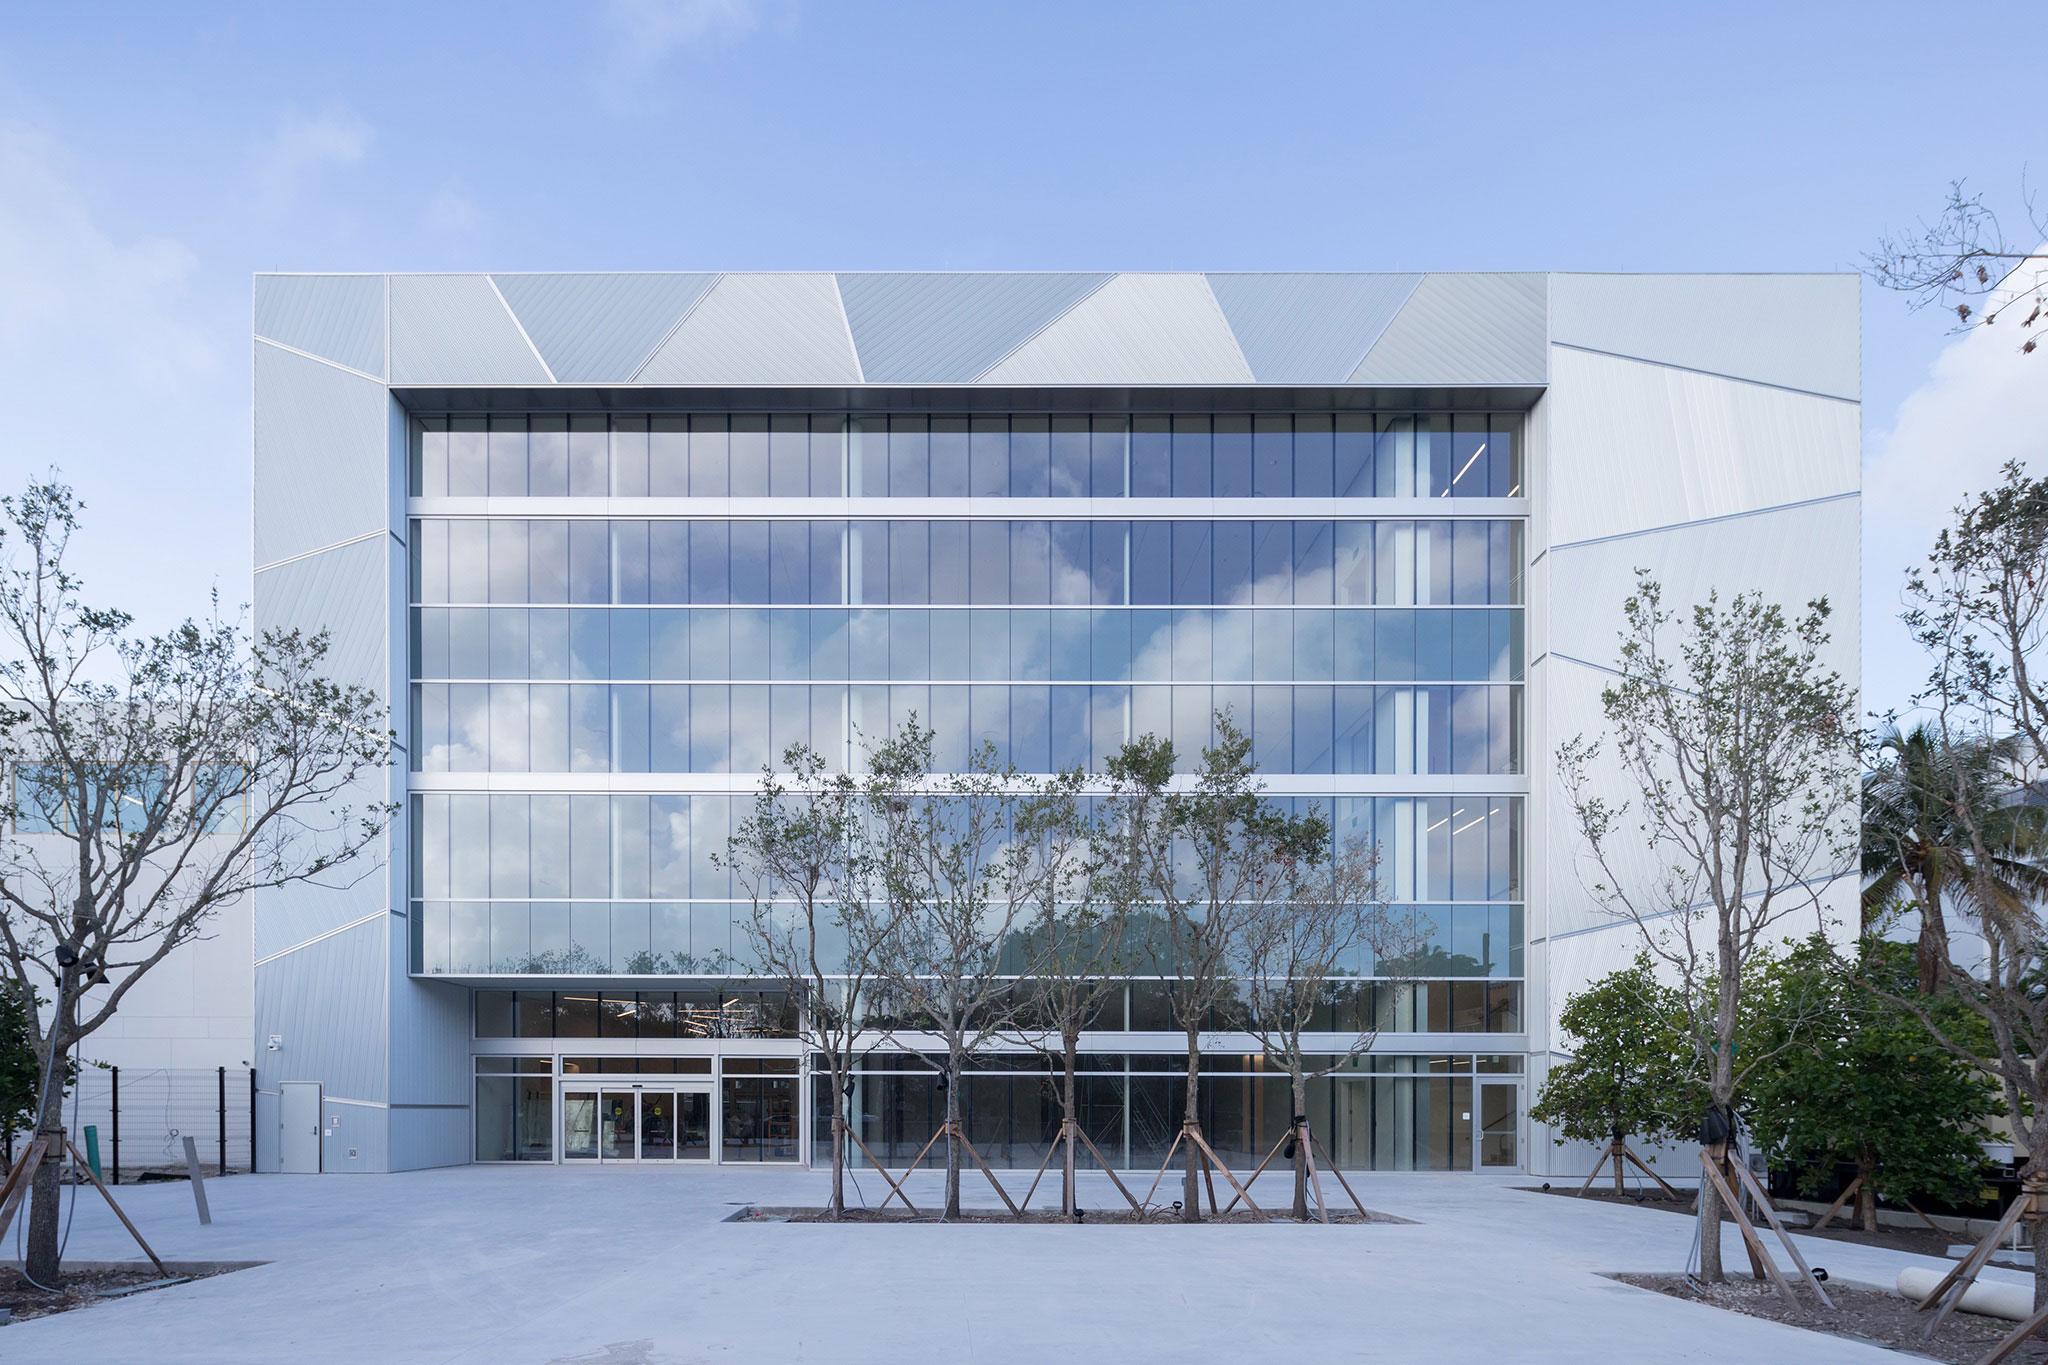 New Headquarters Of The Ica Miami Foundation By Aranguren  # Mutable Muebles